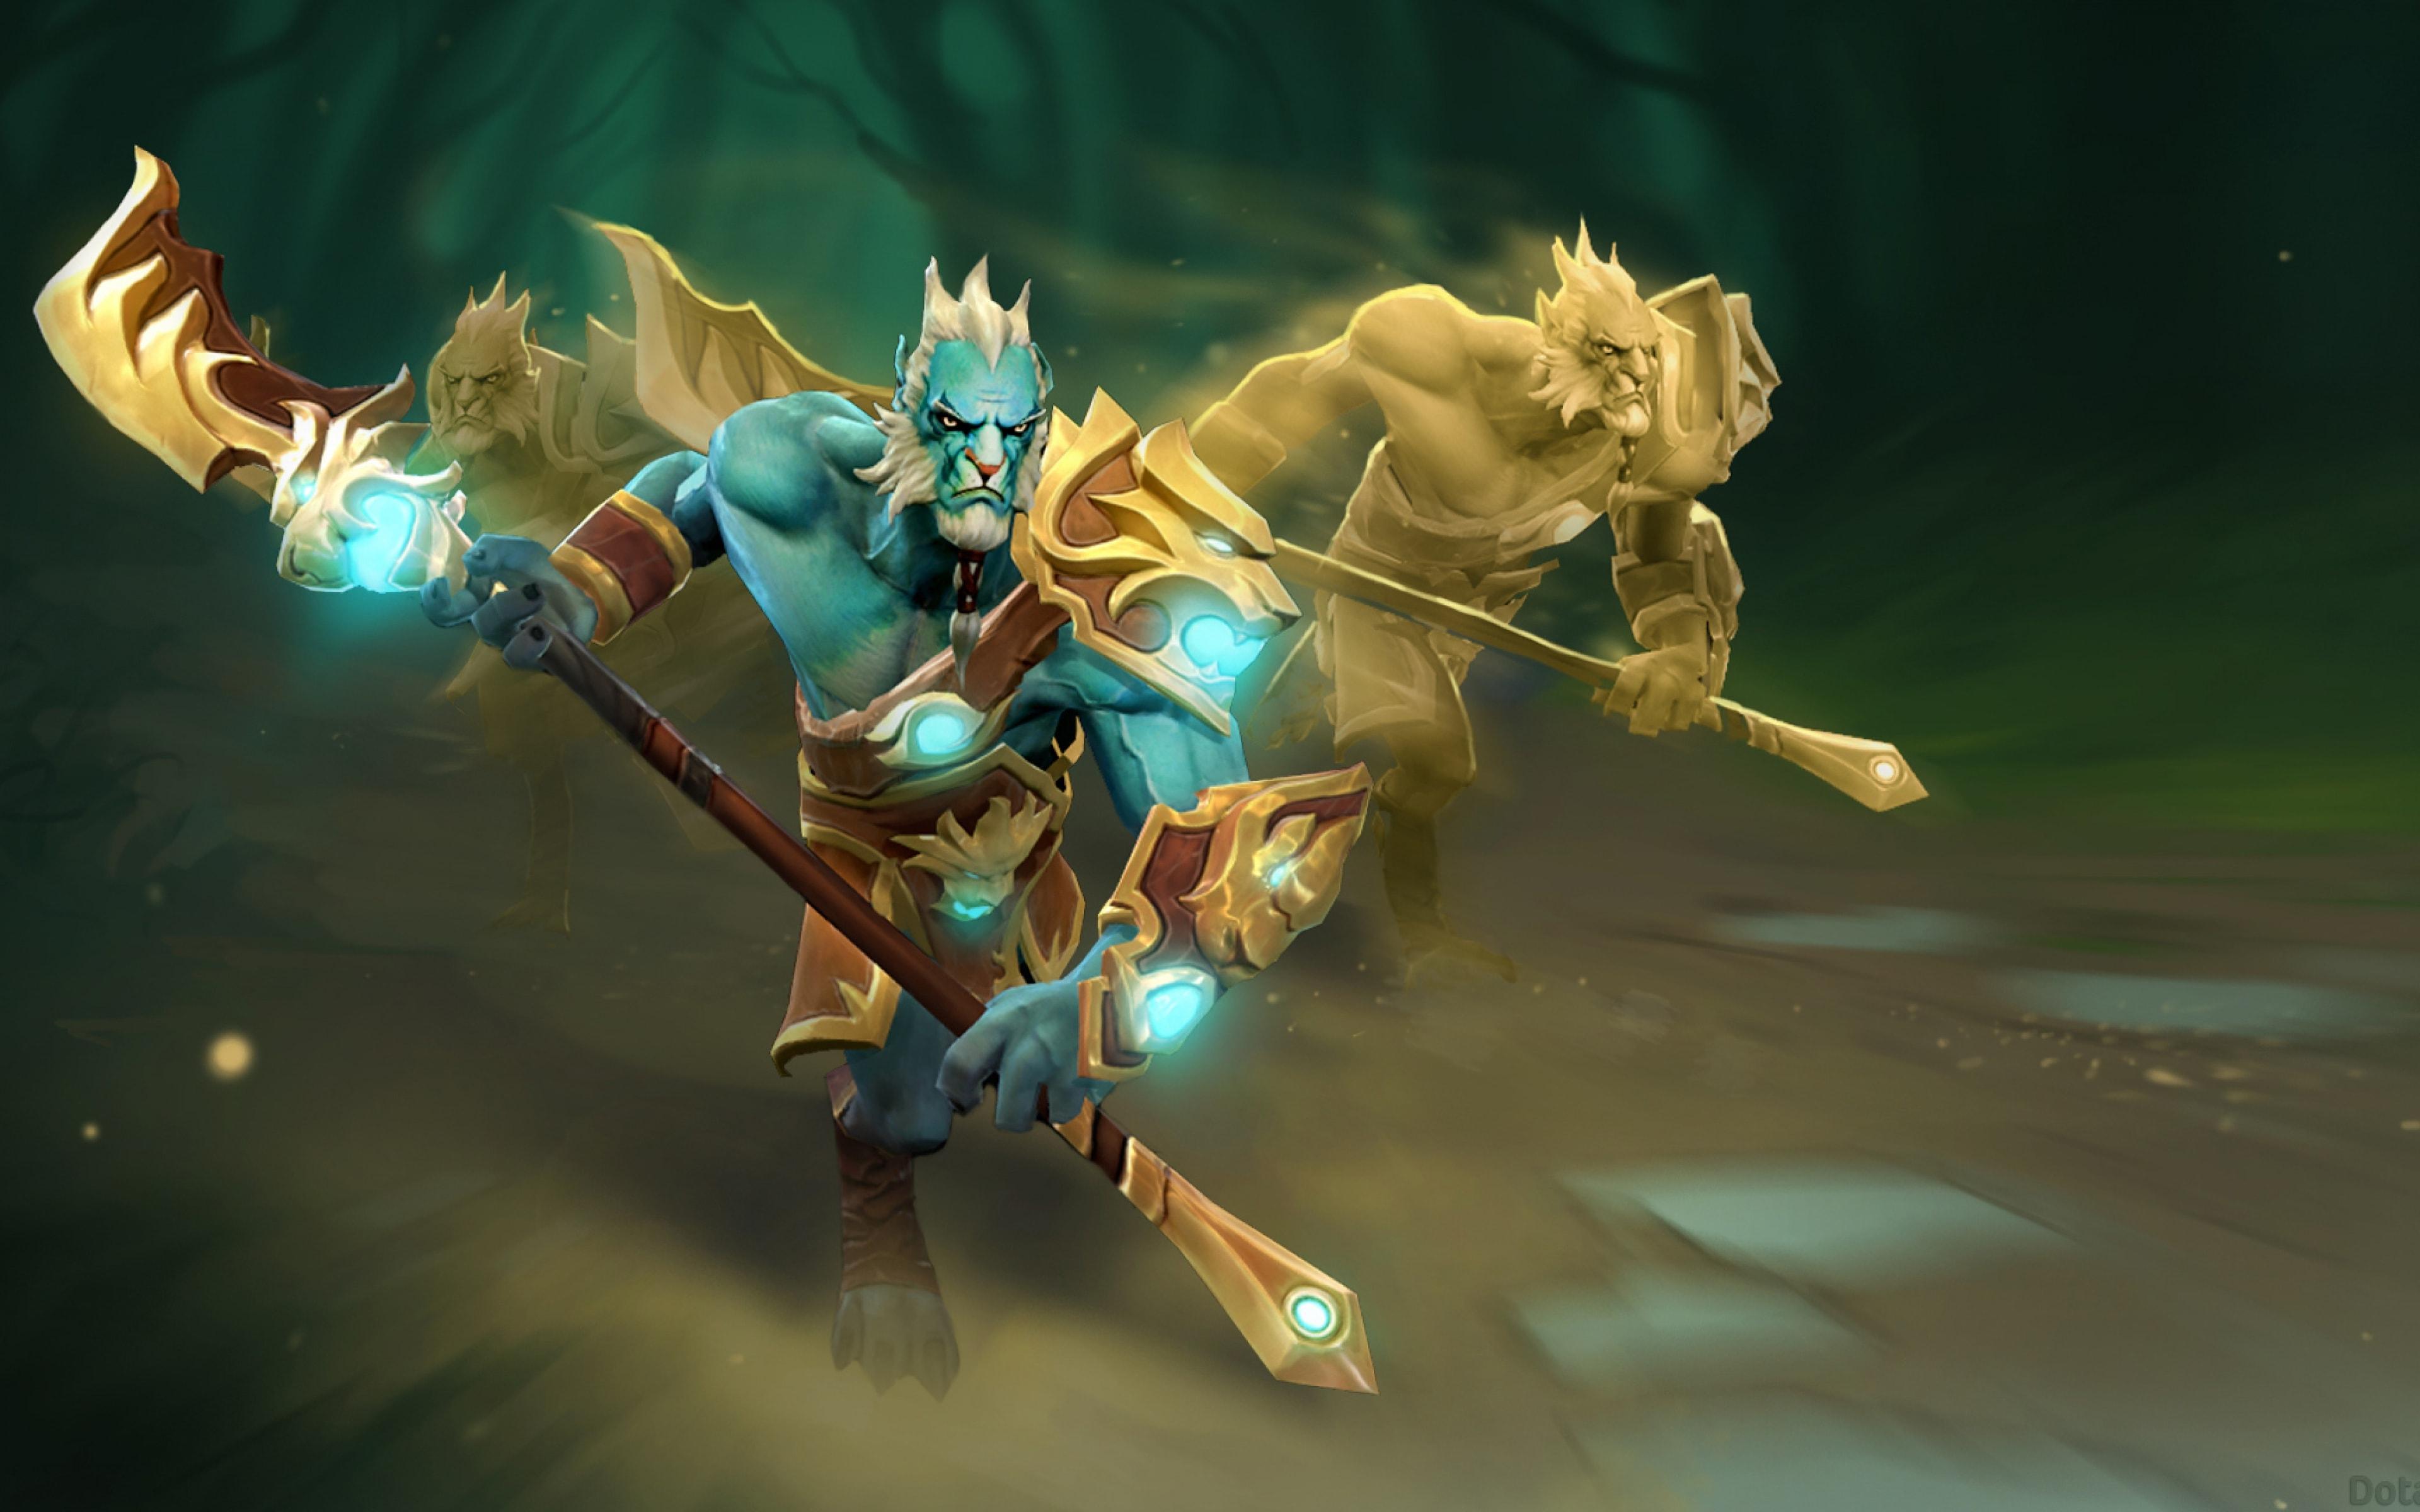 Dota2 : Phantom Lancer Backgrounds